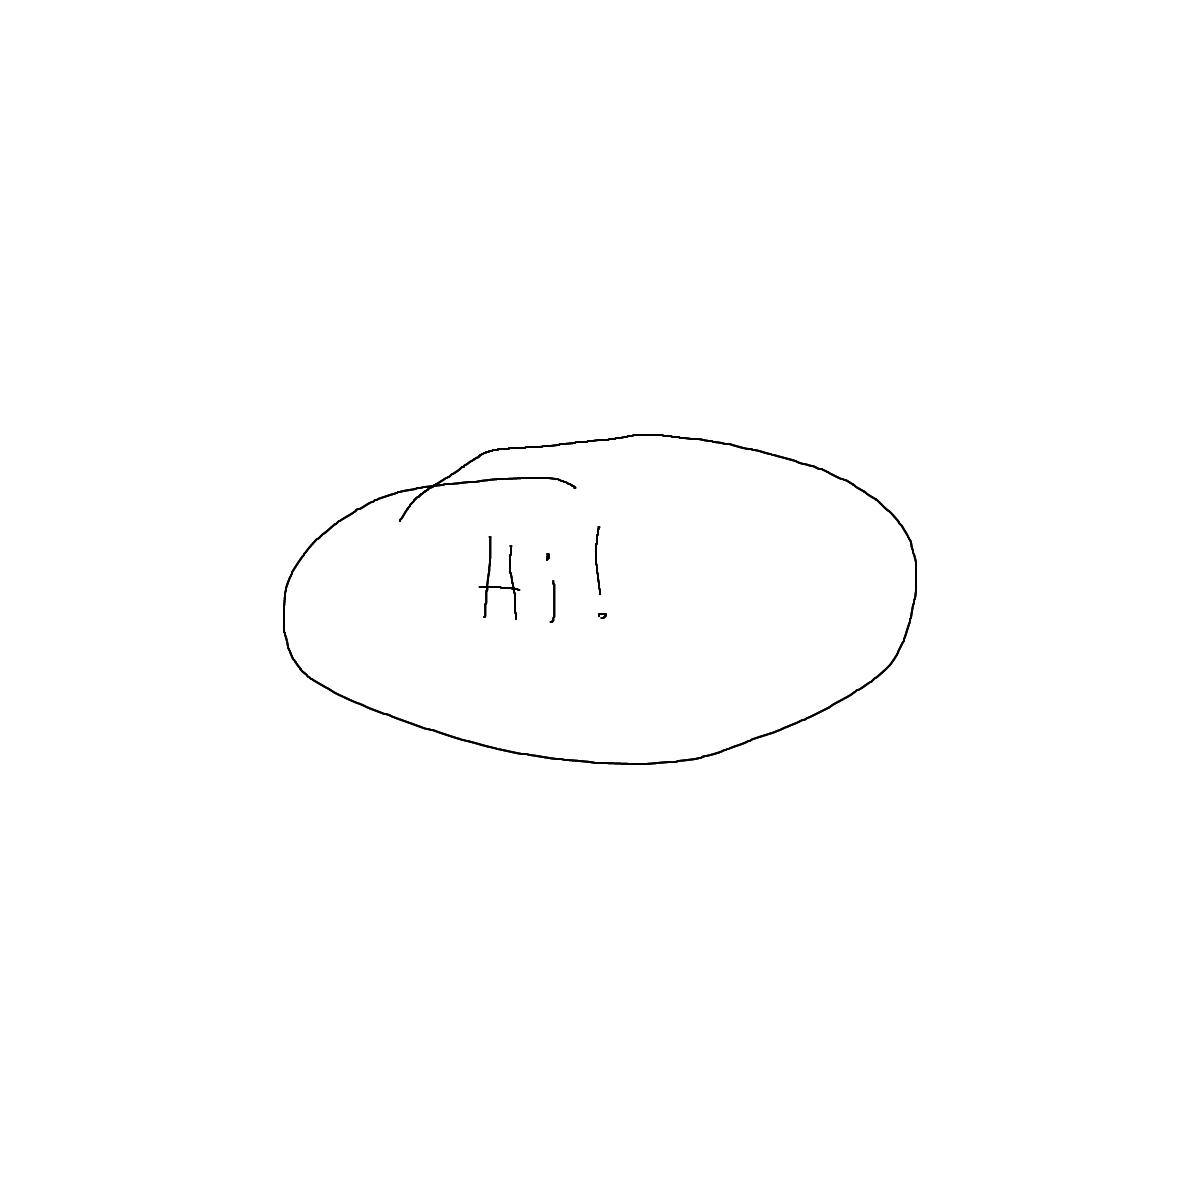 BAAAM drawing#10072 lat:49.0647964477539060lng: 17.4461517333984380